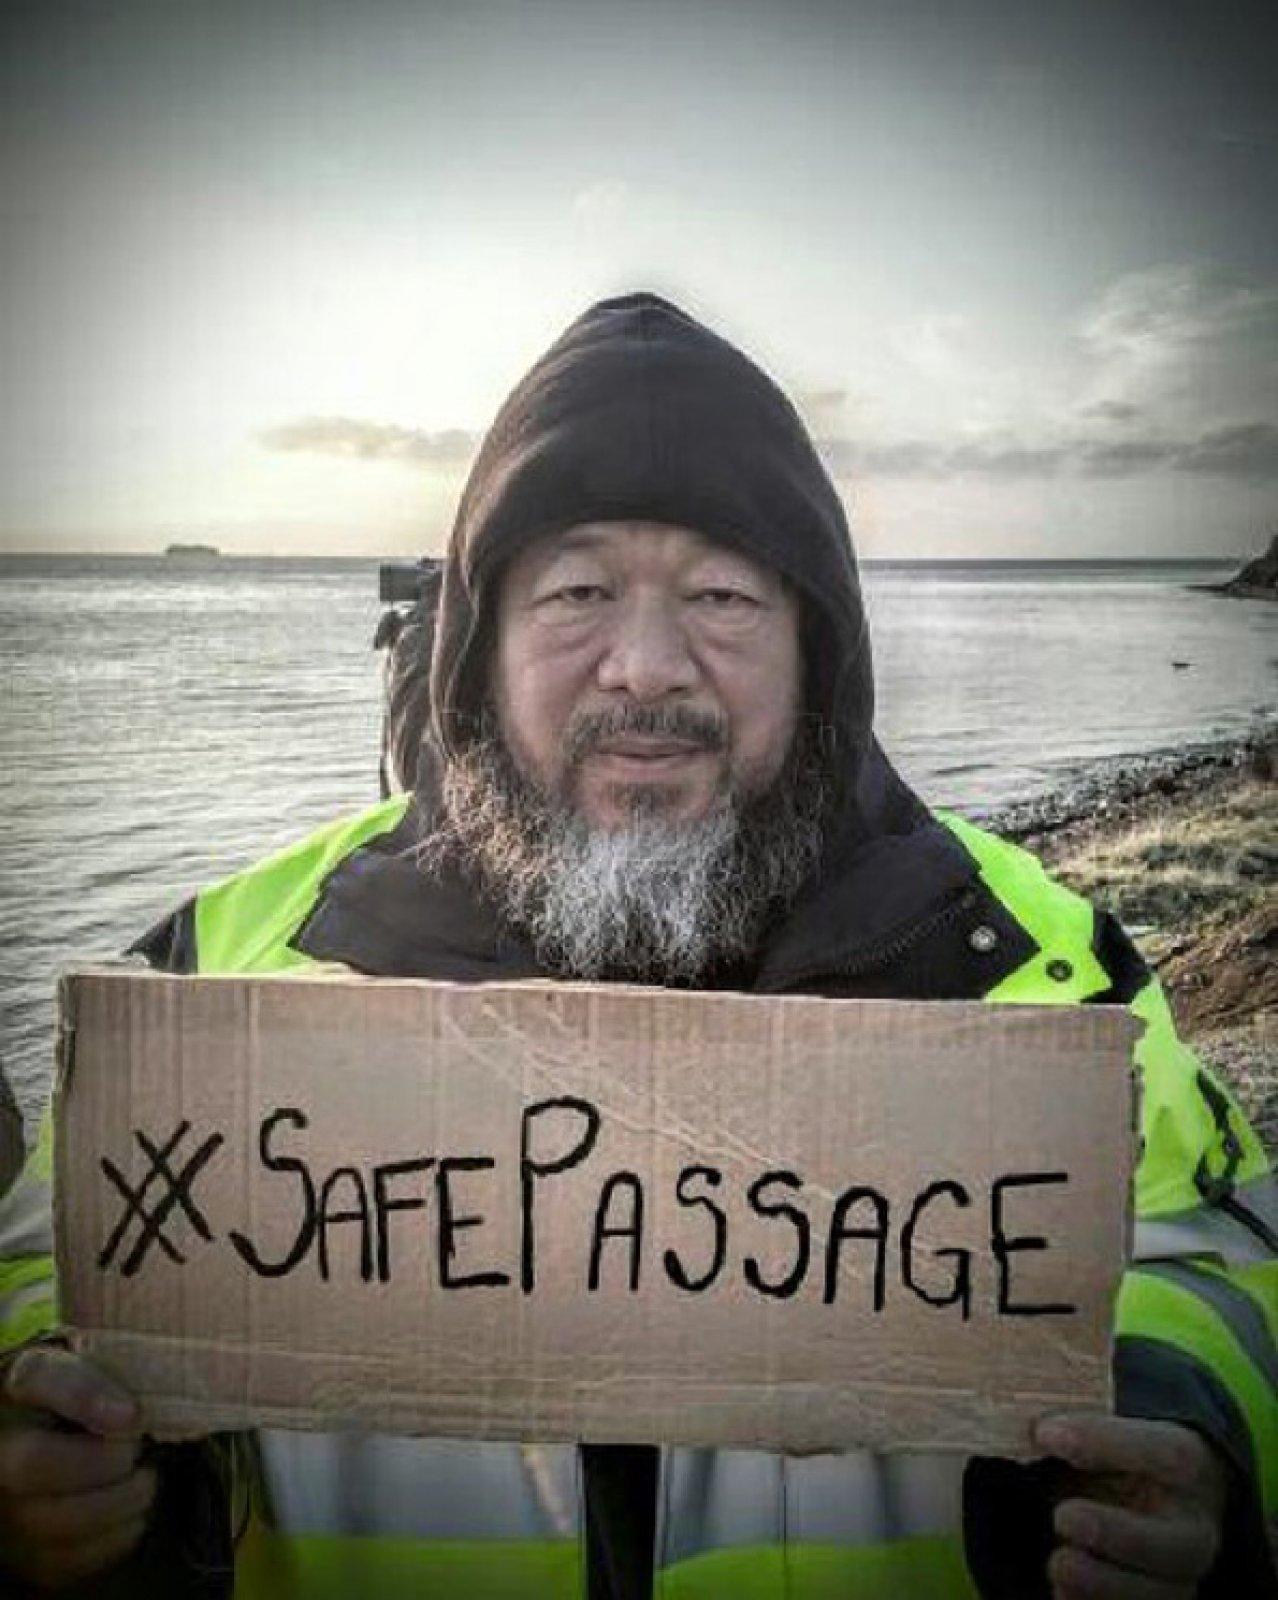 #SafePassage, 2016 © Ai Weiwei Studio